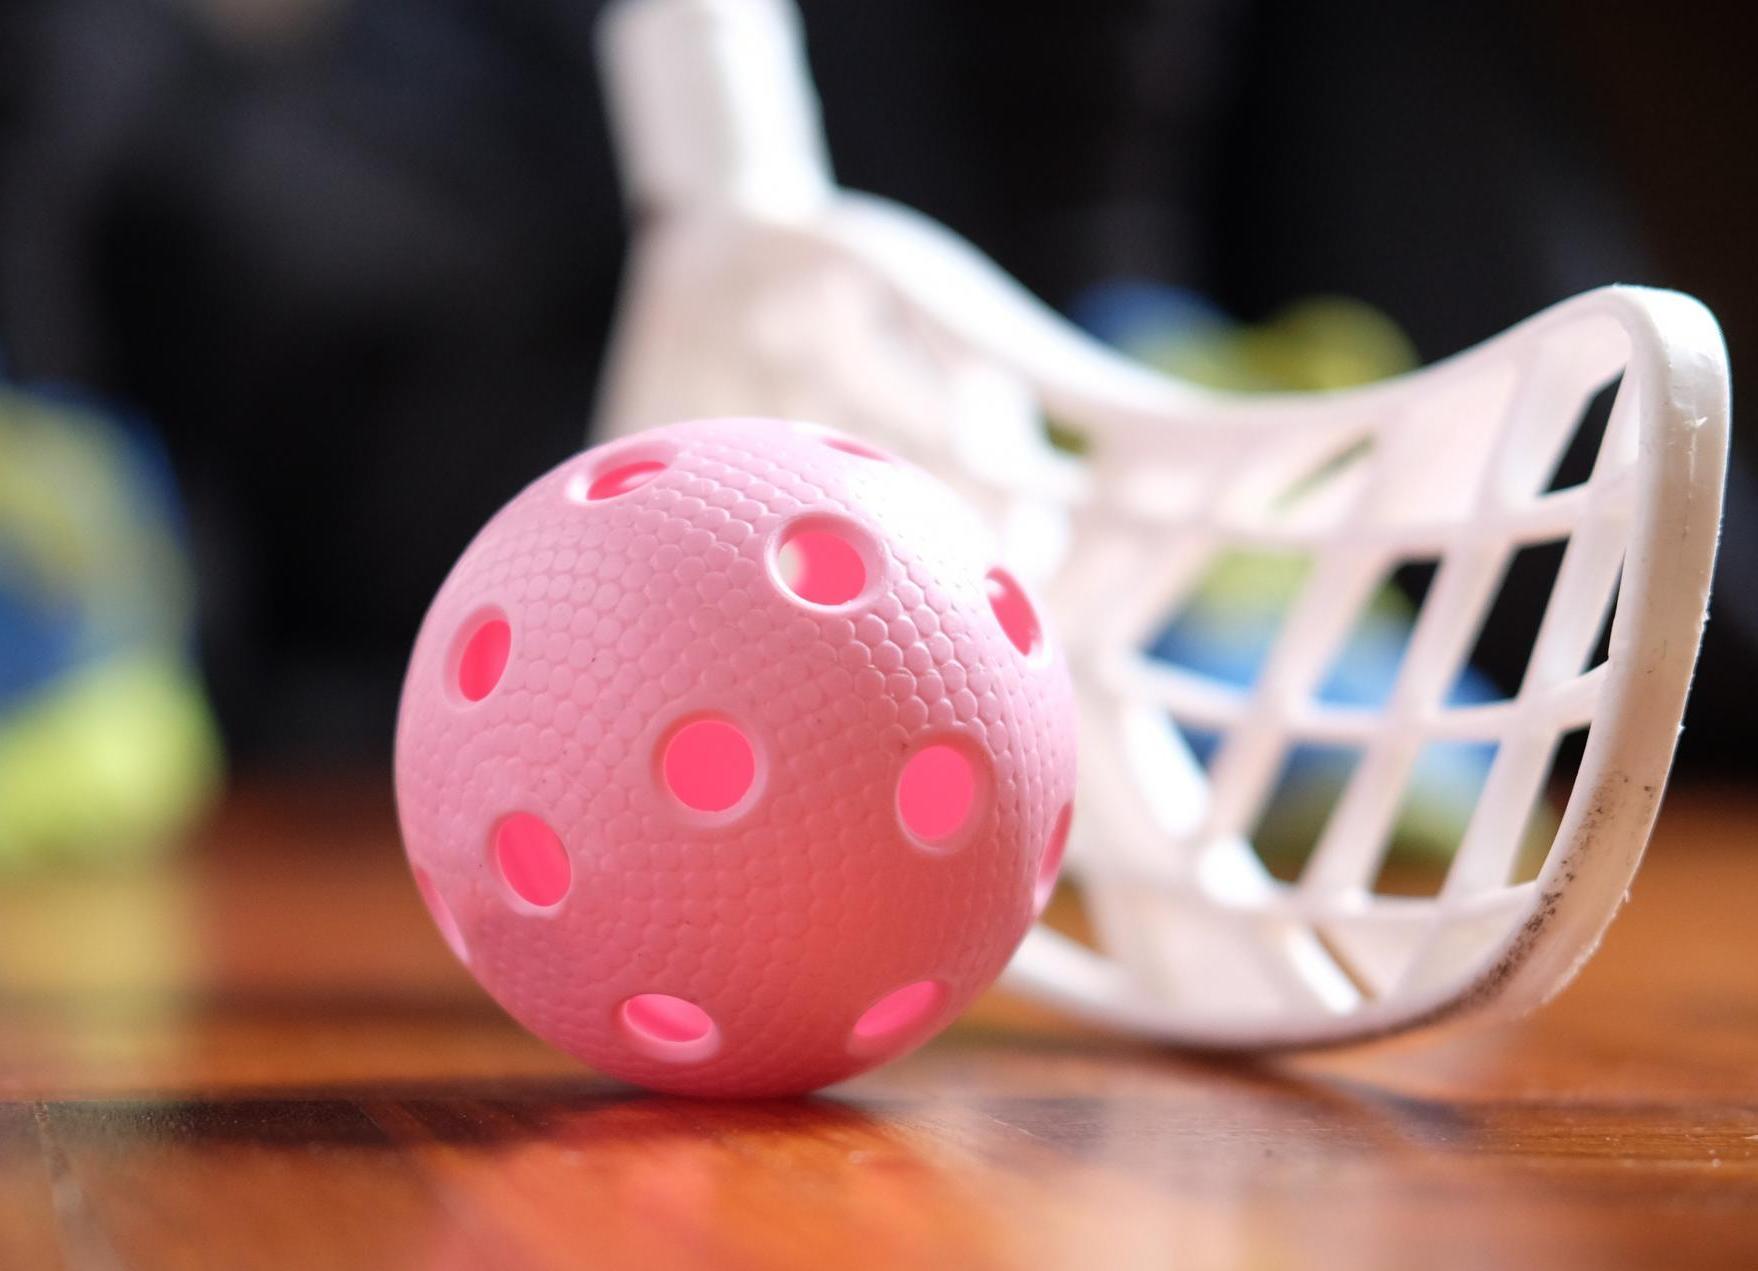 floorball ball and stick